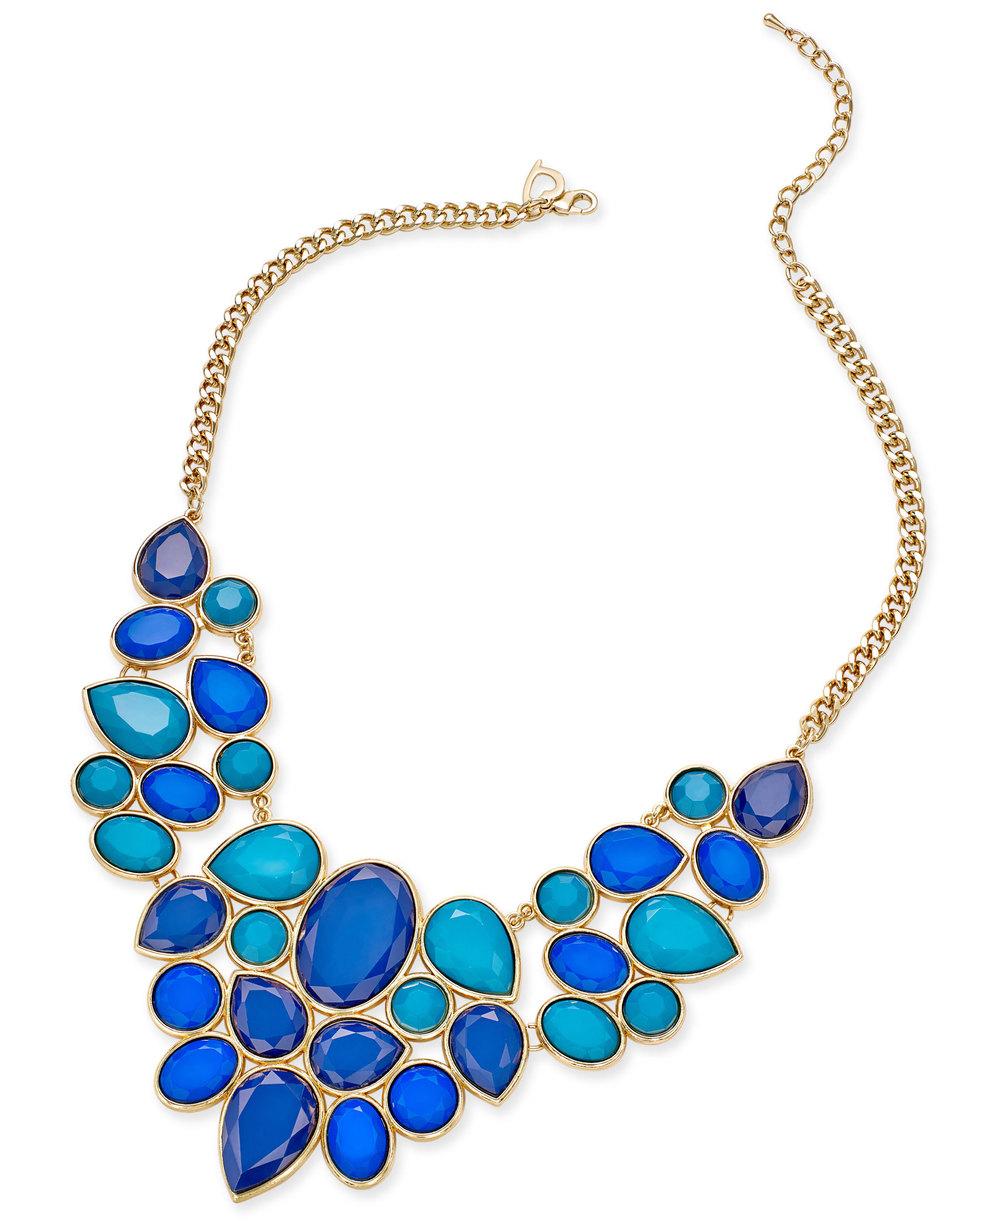 Thalia_Sodi_Gold-Tone_Blue_Stone_Statement_Necklace,_Only_at_Macy's_-__39.50.jpg